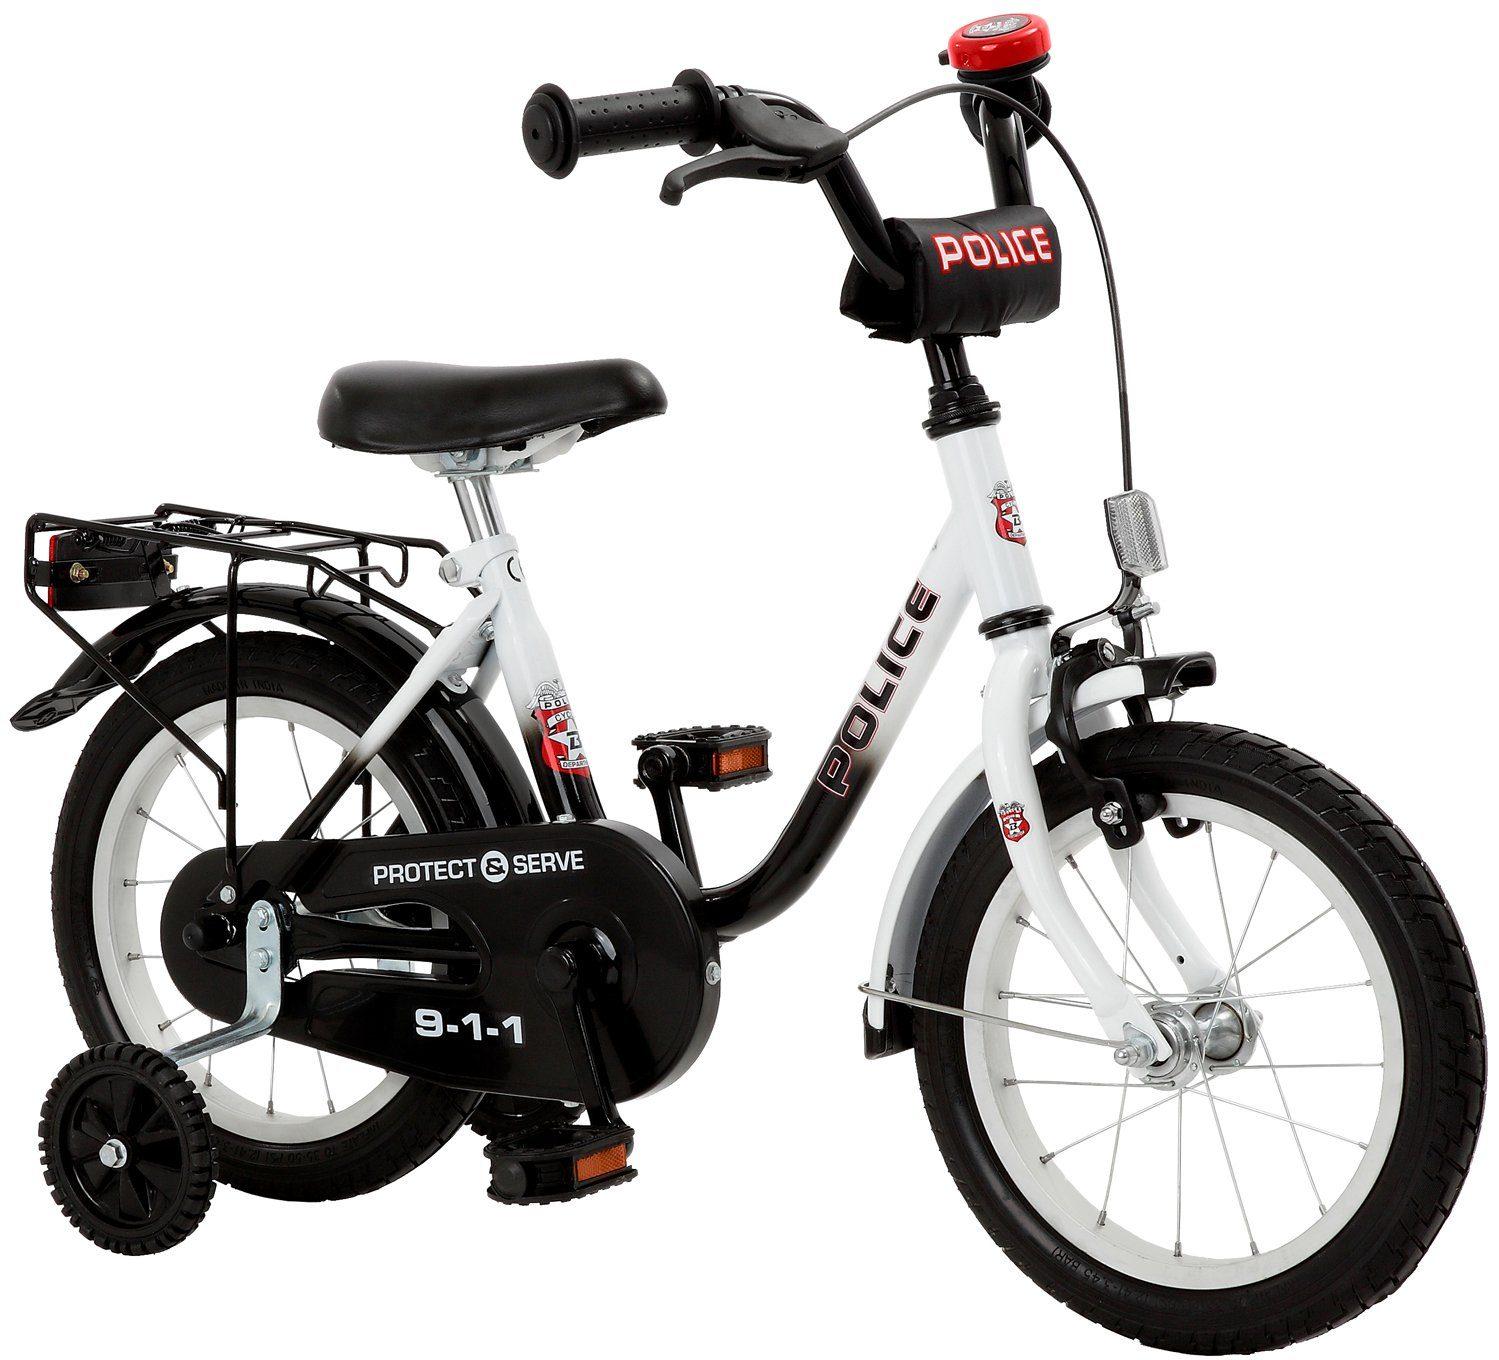 Cycles4Kids Kinderfahrrad »Police, 35,6 cm (14 Zoll)«